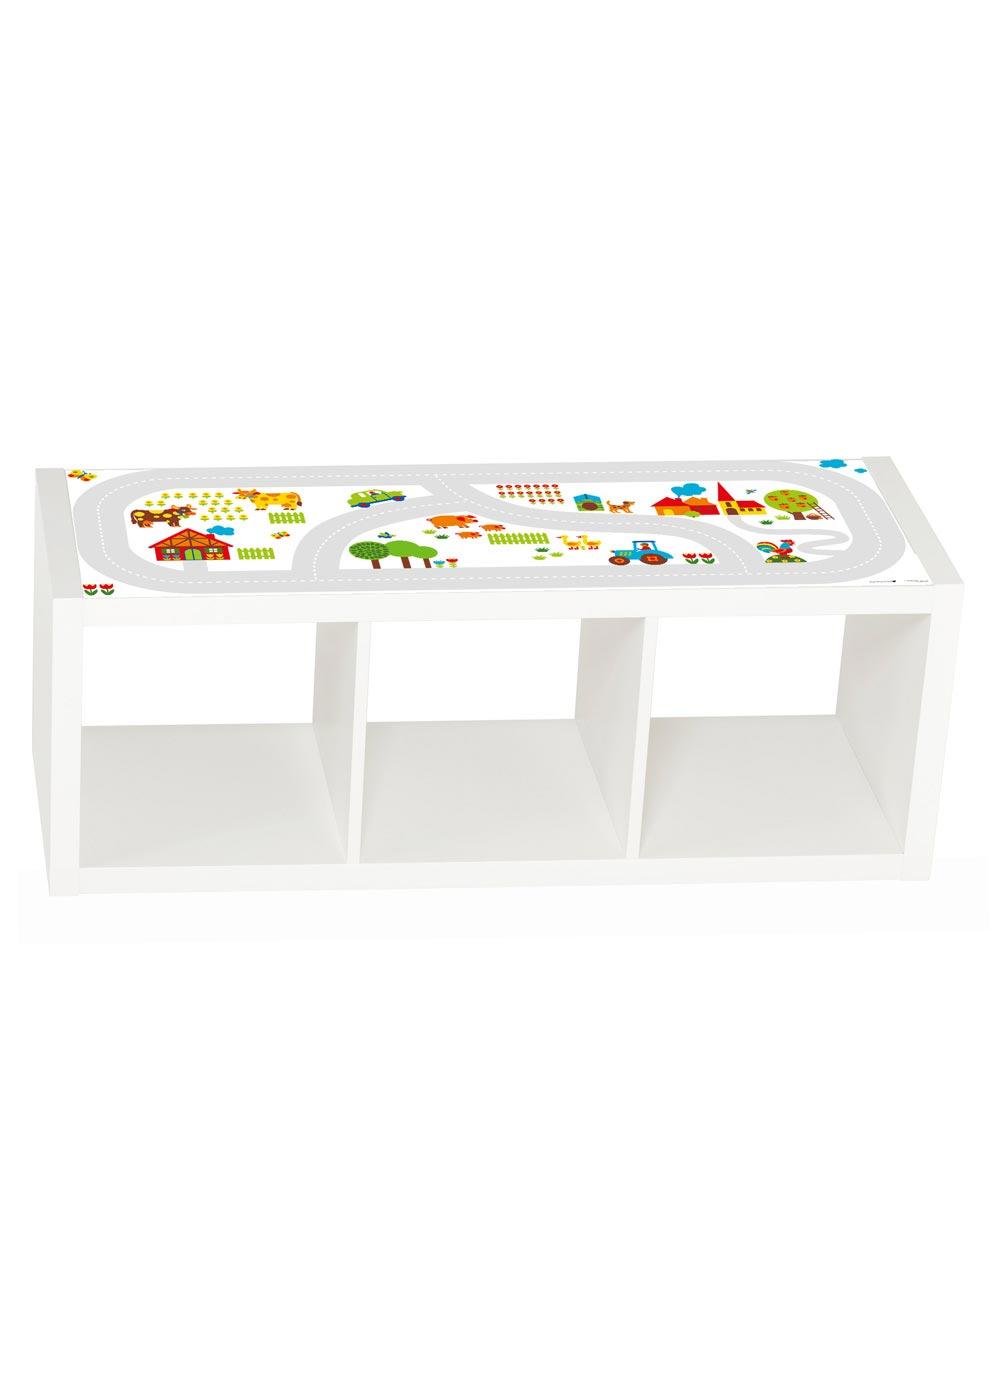 Ikea Kallax Regal ByGraziela Bauernhof 3fach Frontansicht